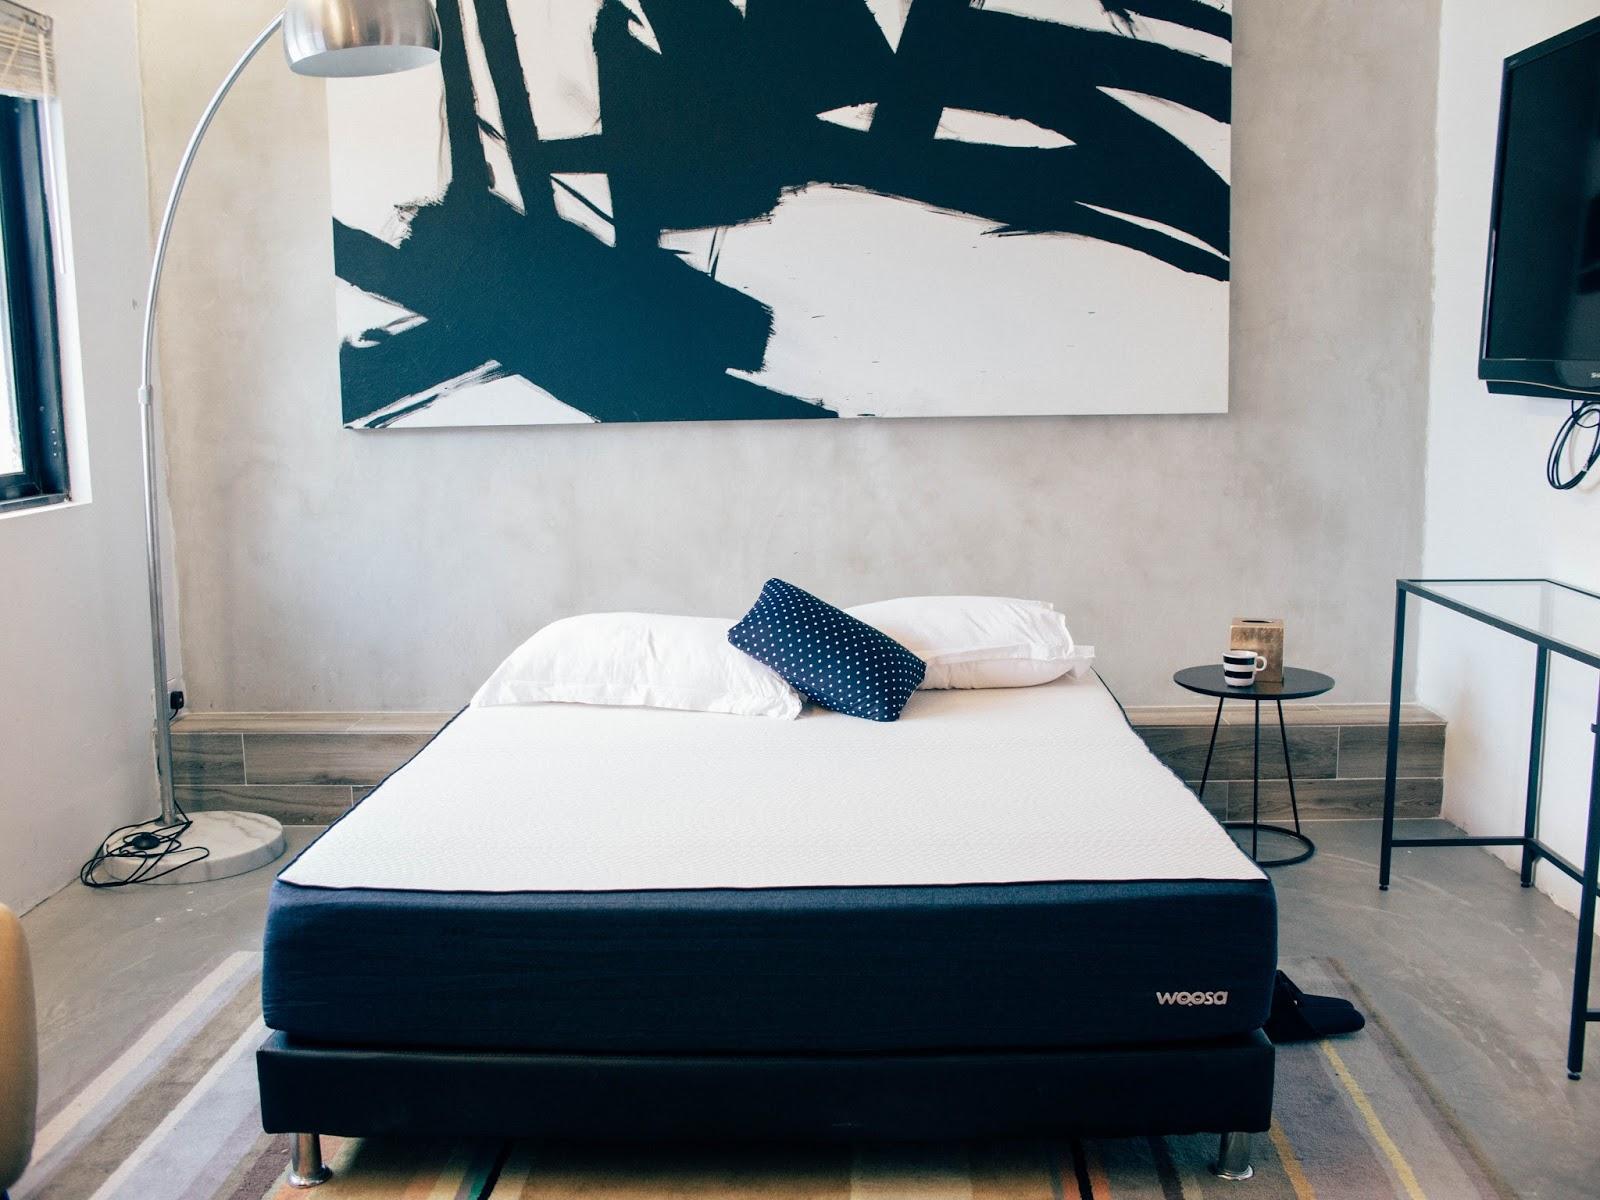 woosa mattress, memory foam, singapore, affordable mattress, sleep